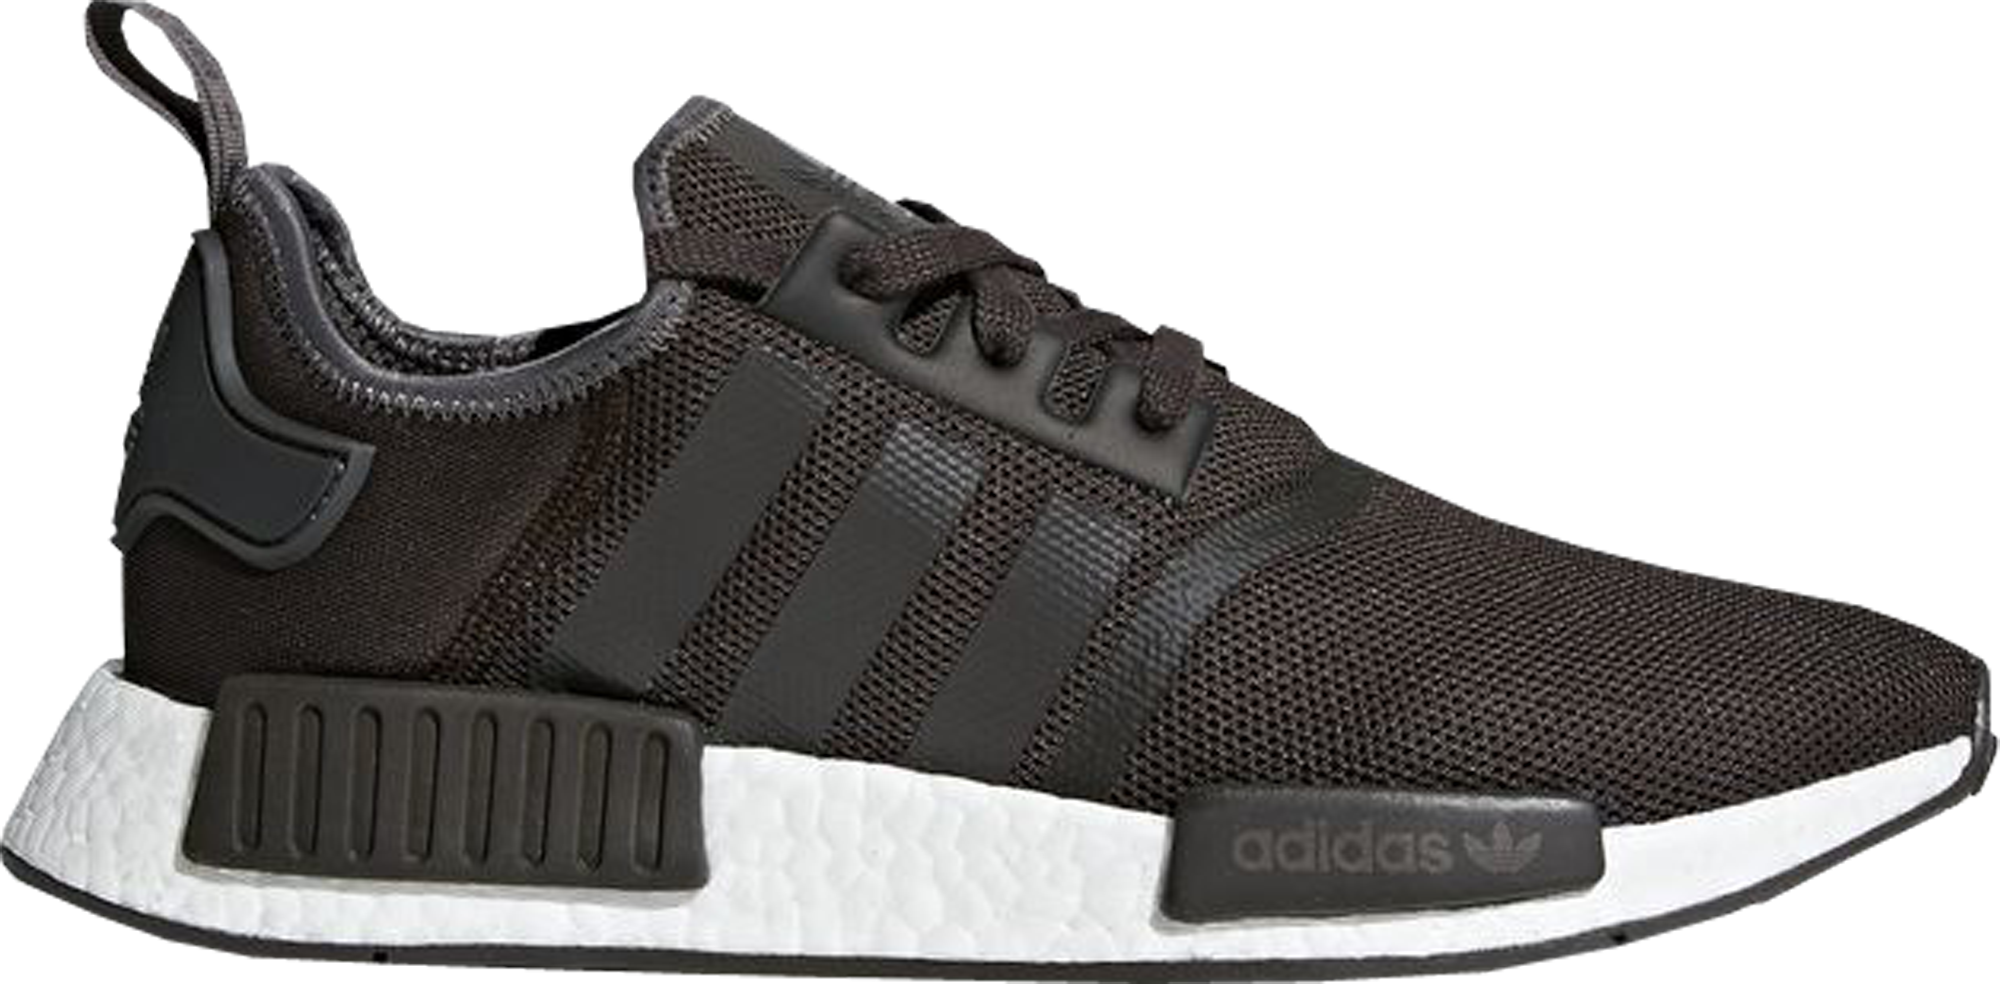 3ebf3075079f BAPE x adidas NMD R1 Pack Le Site De La Sneaker